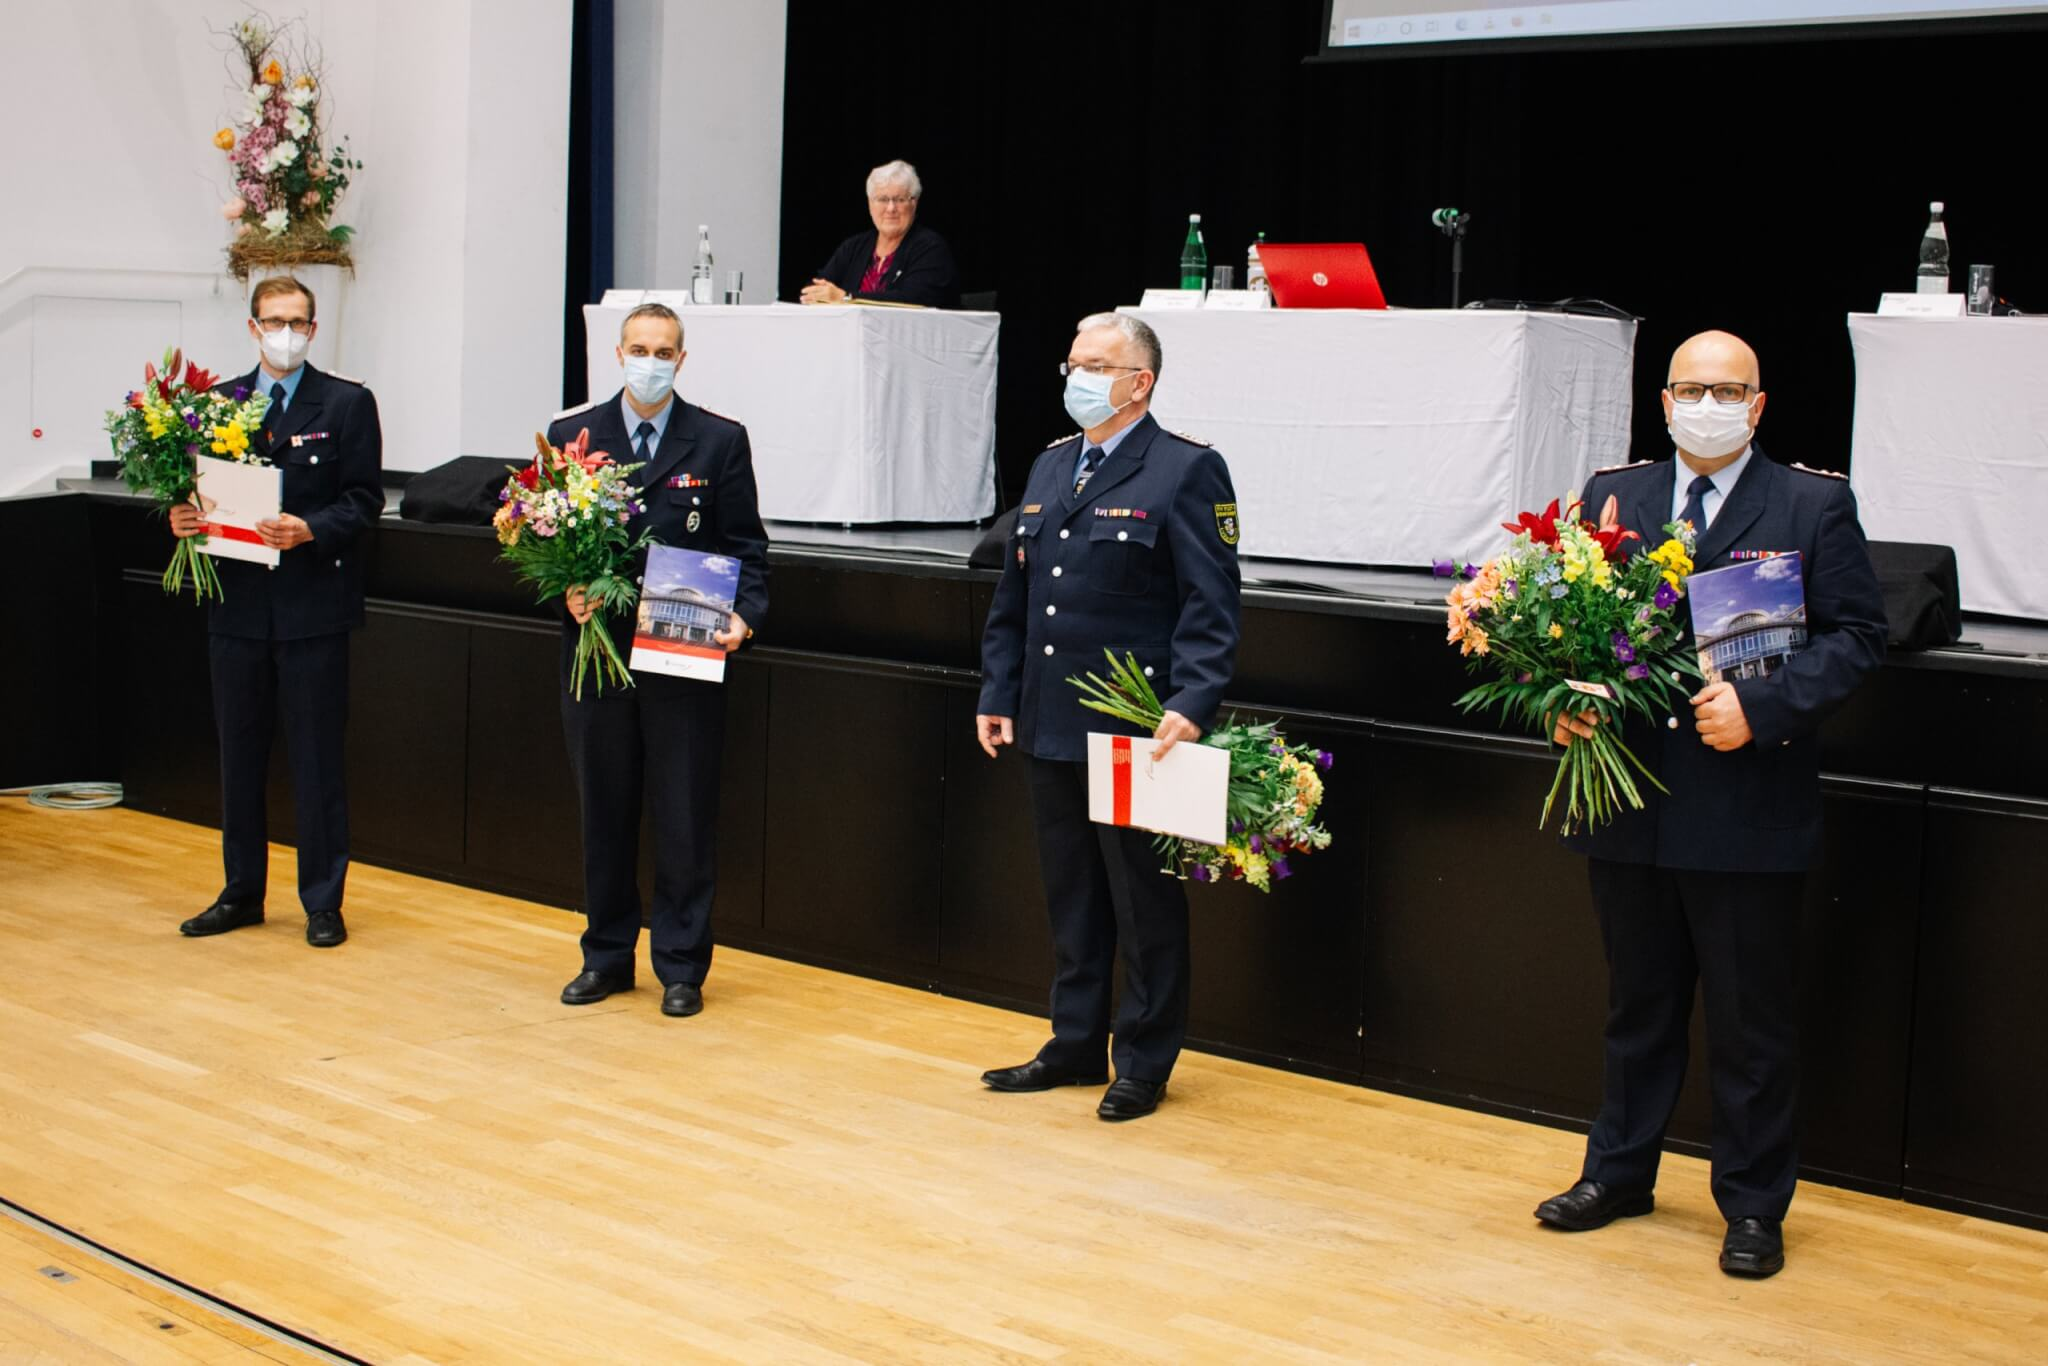 Stadtverordnetenversammlung-20